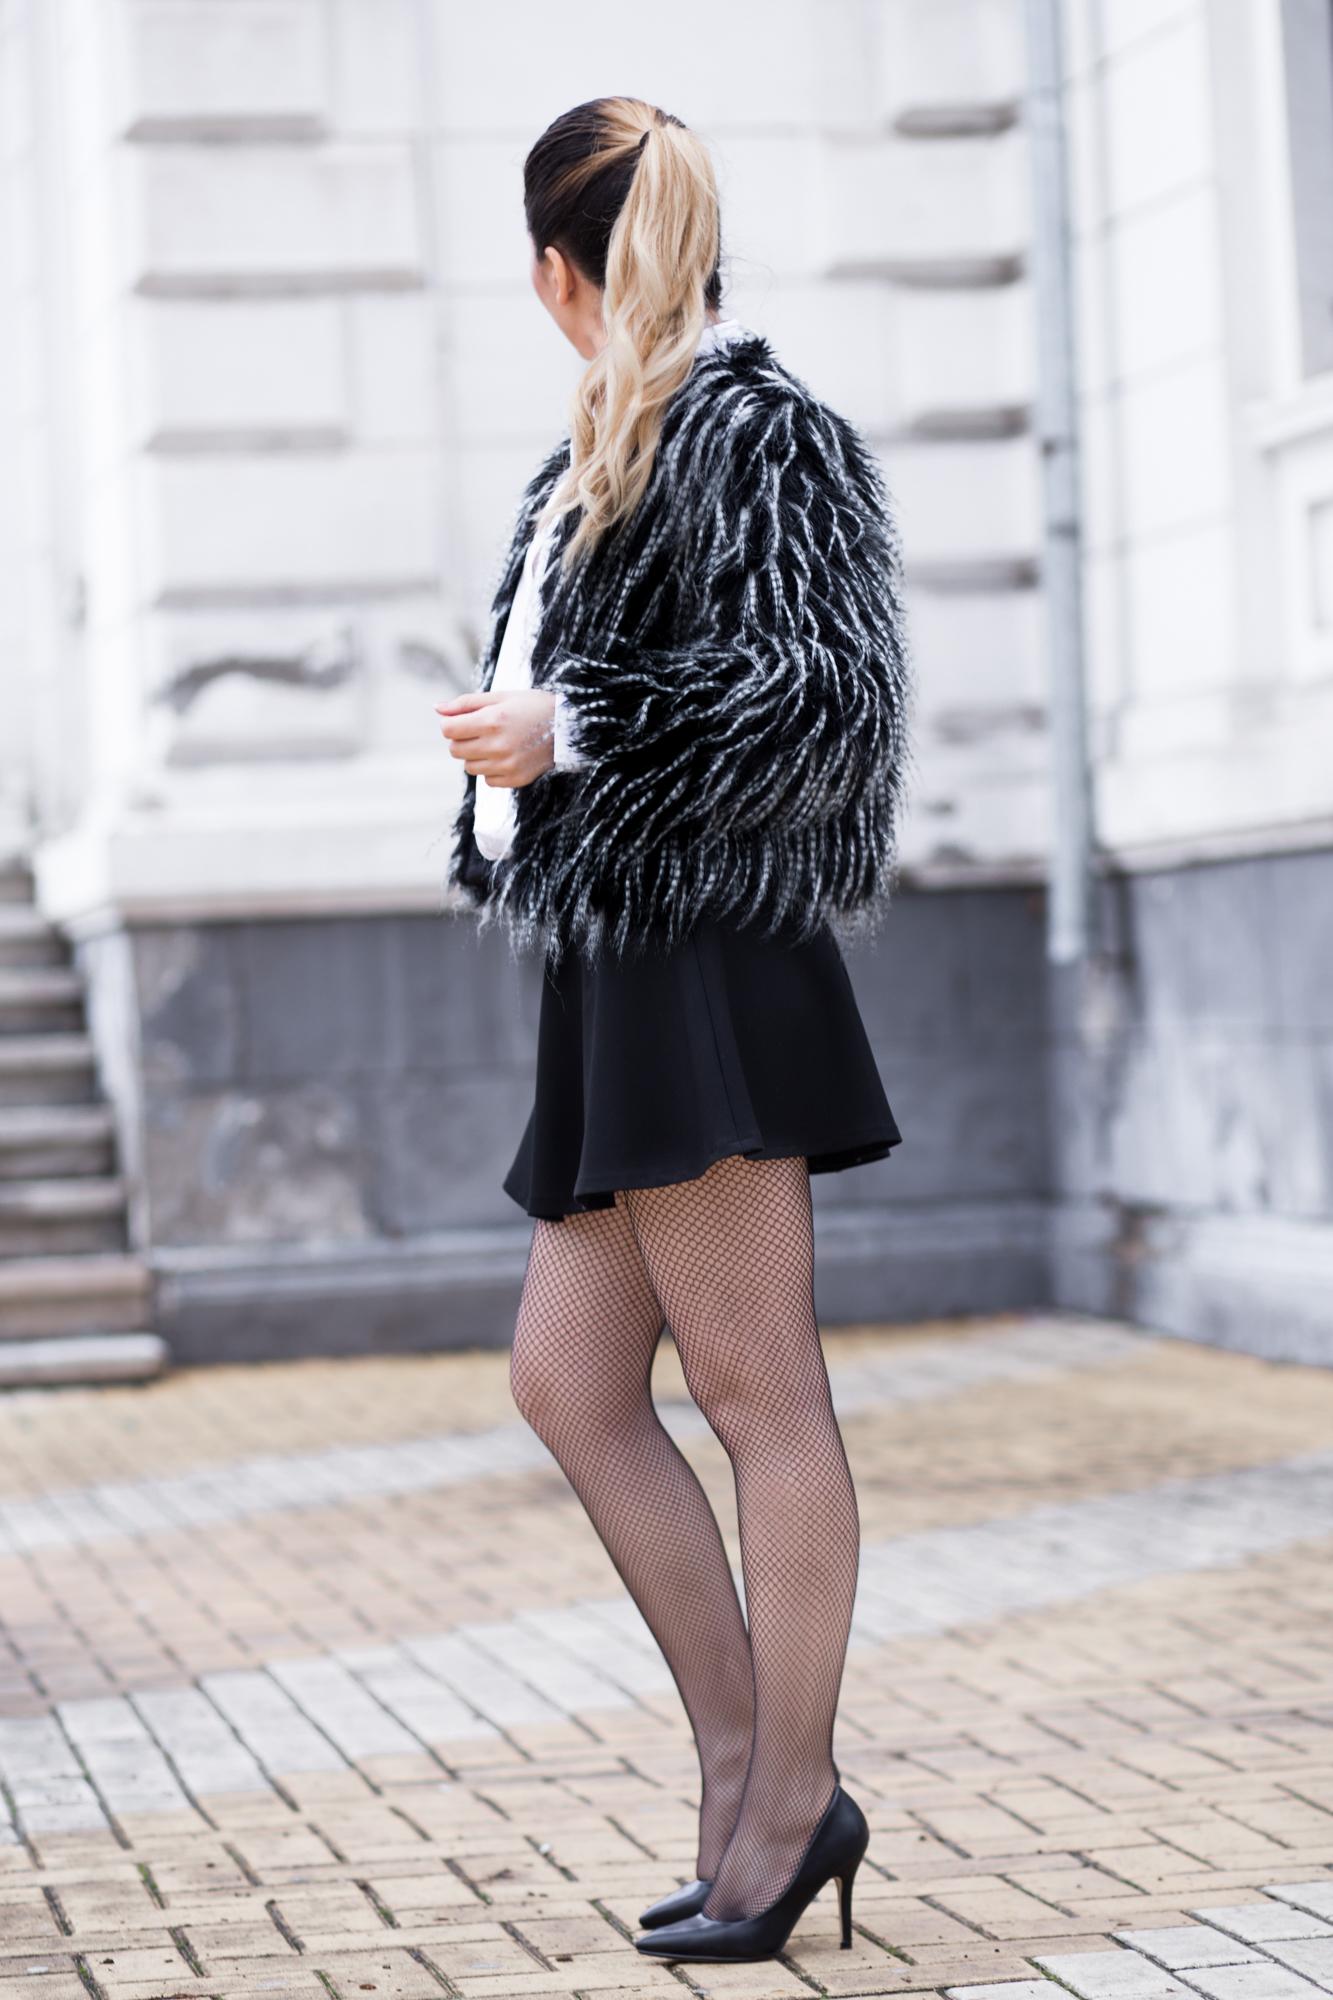 Tinuta alb negru cu fusta Andreea Design semi clos. Cum purtam jacheta de blana artificiala iarna?